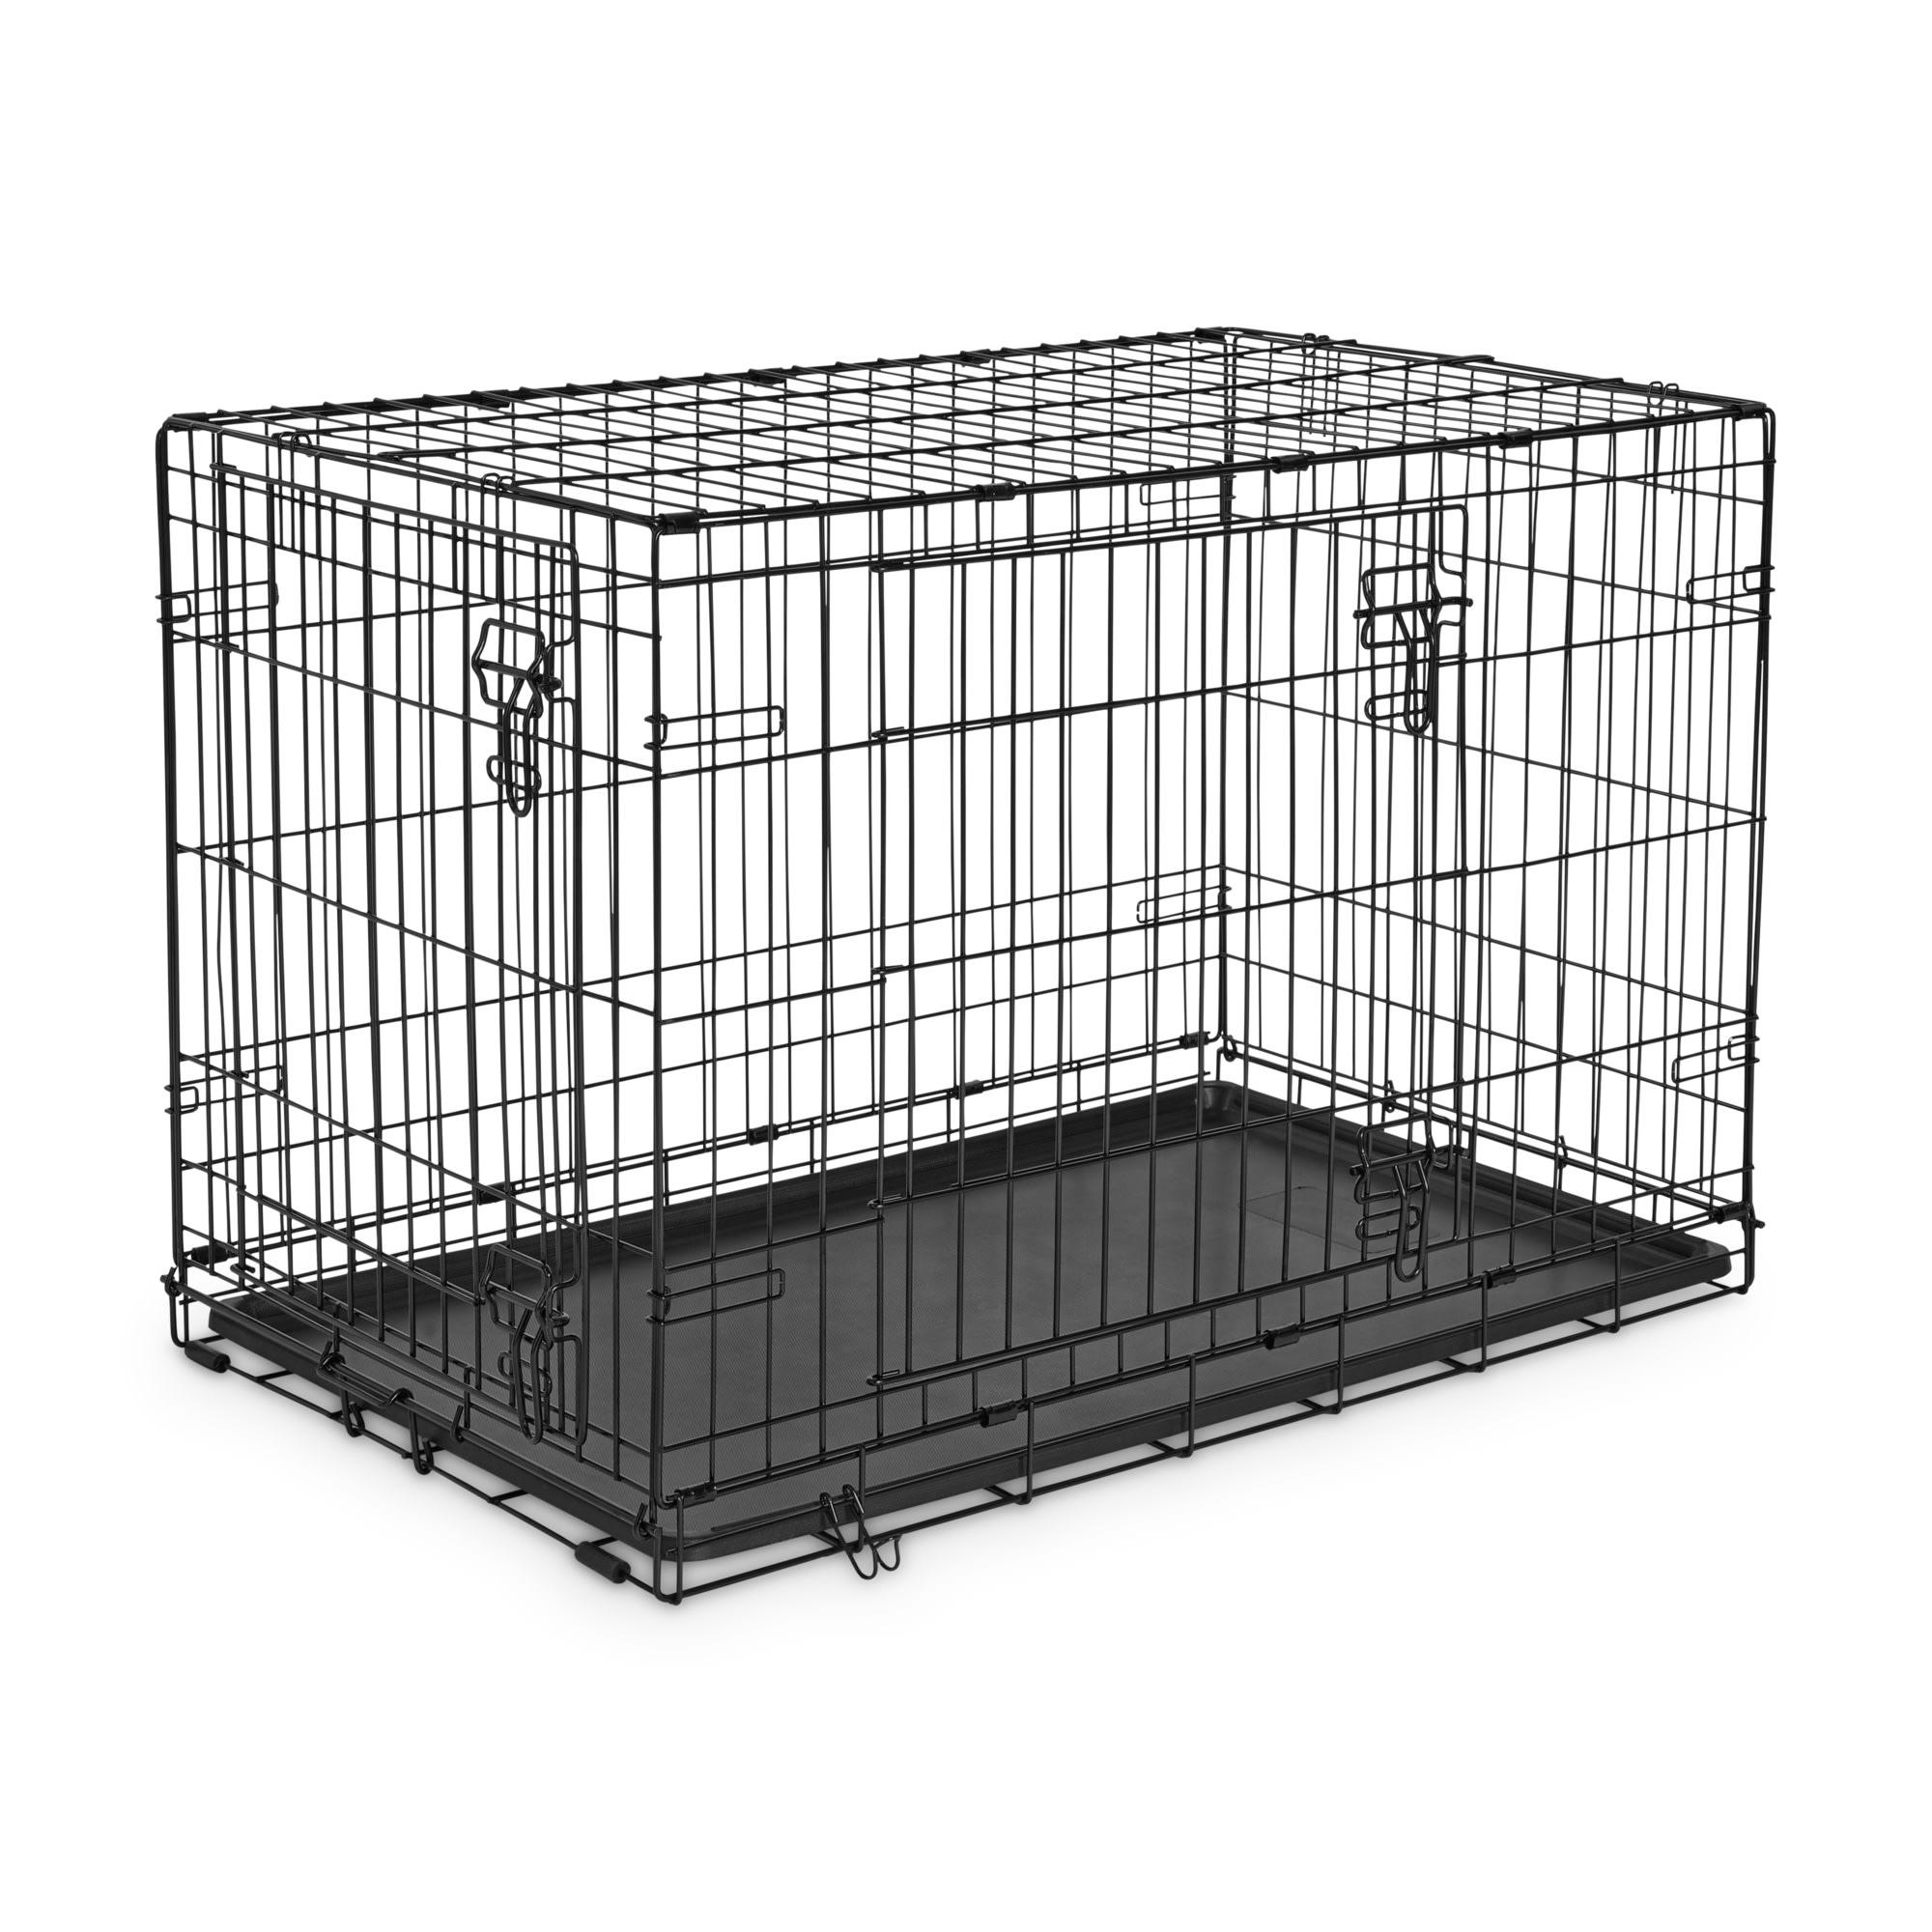 Animaze 20 Door Folding Dog Crate, 20.20